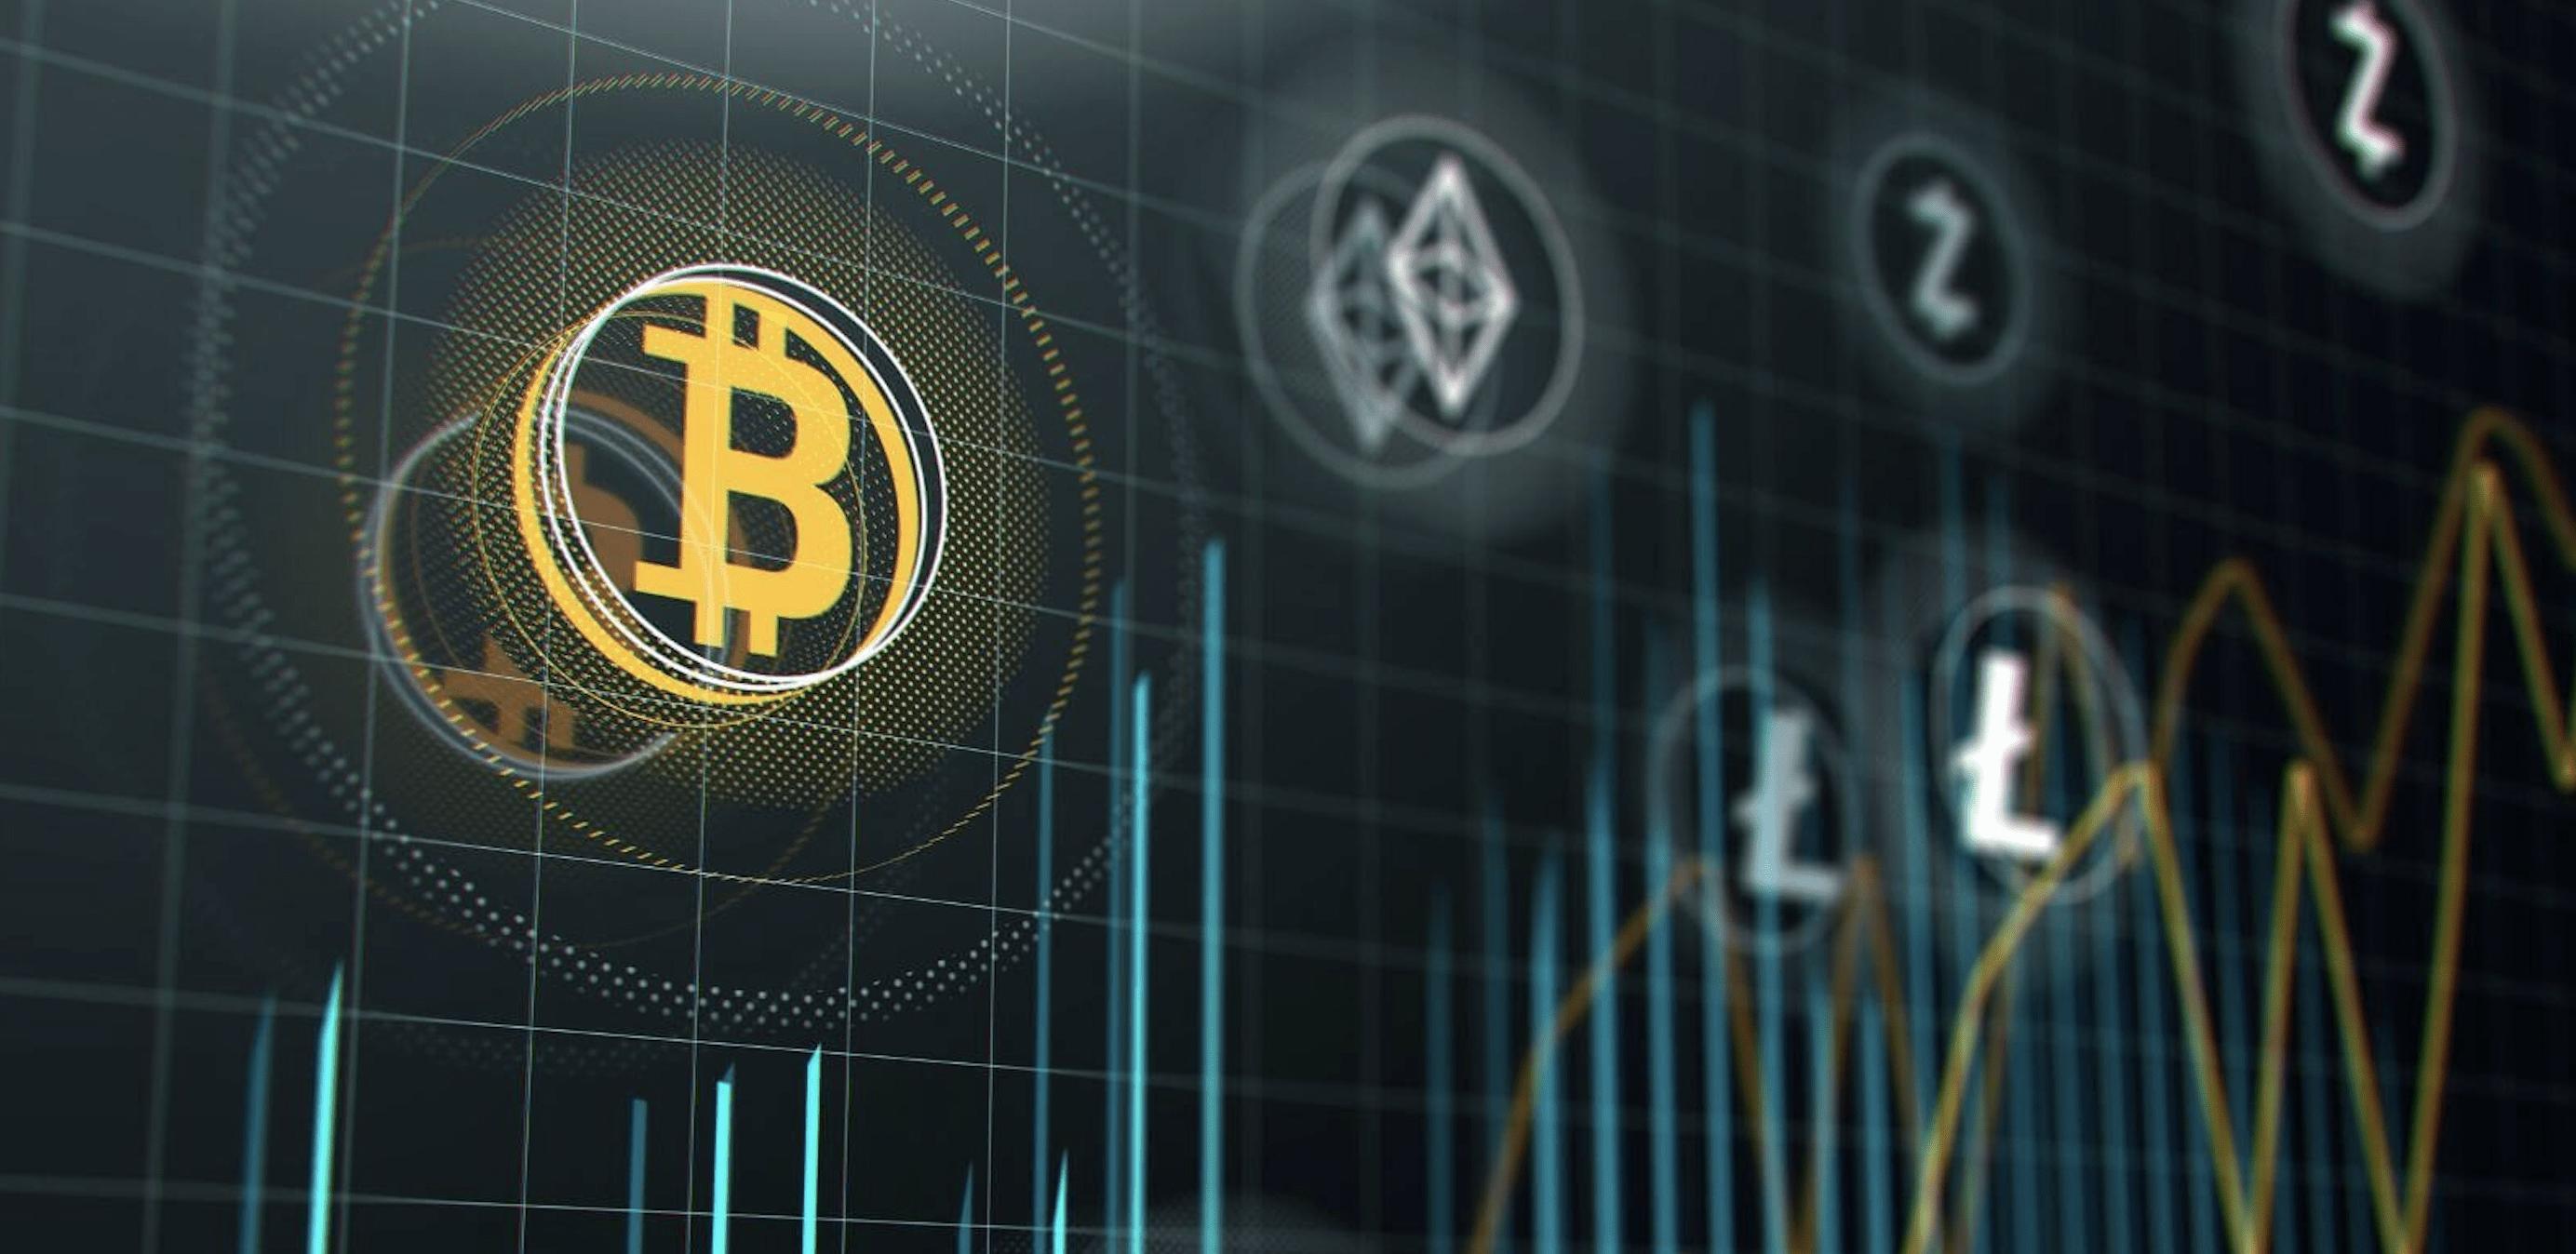 Banque crypto monnaies néo banques crypo friendly 2021